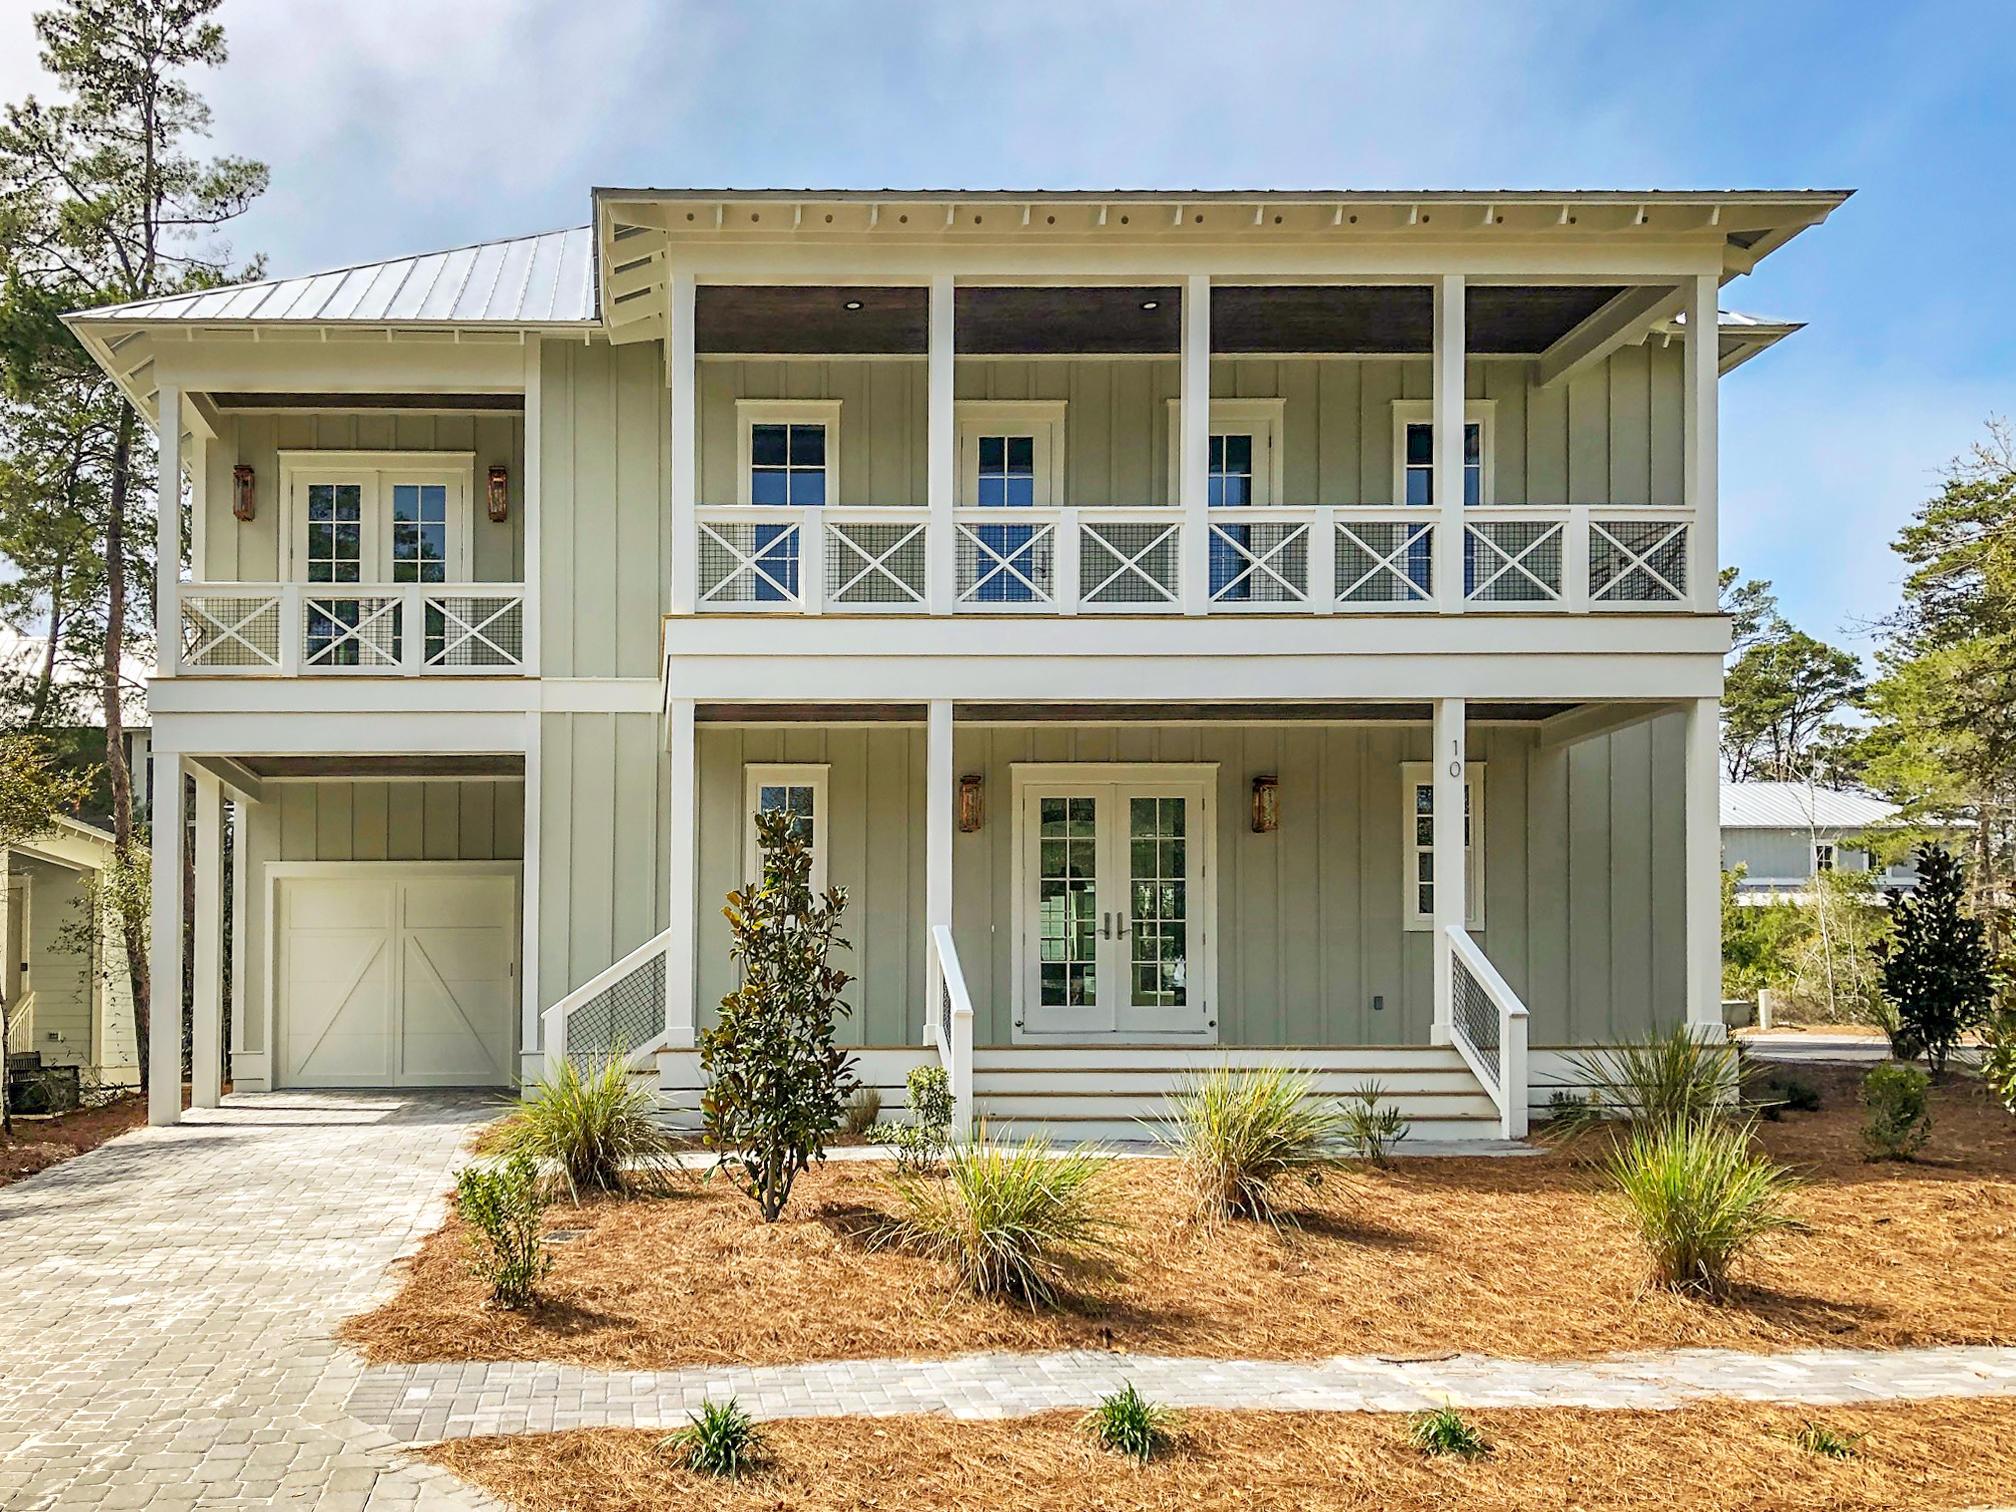 Photo of home for sale at 10 Kristin, Santa Rosa Beach FL